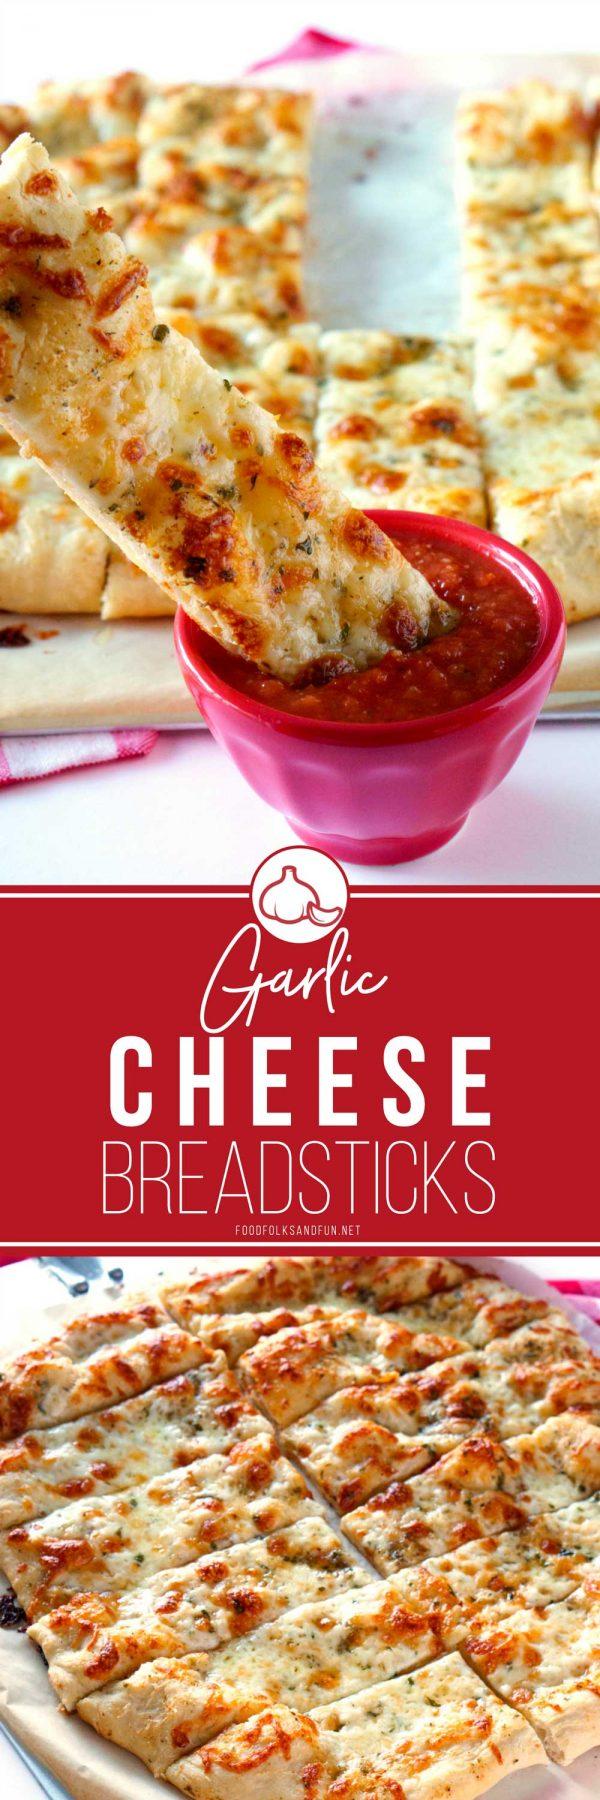 The best ever garlic cheese breadsticks recipe.